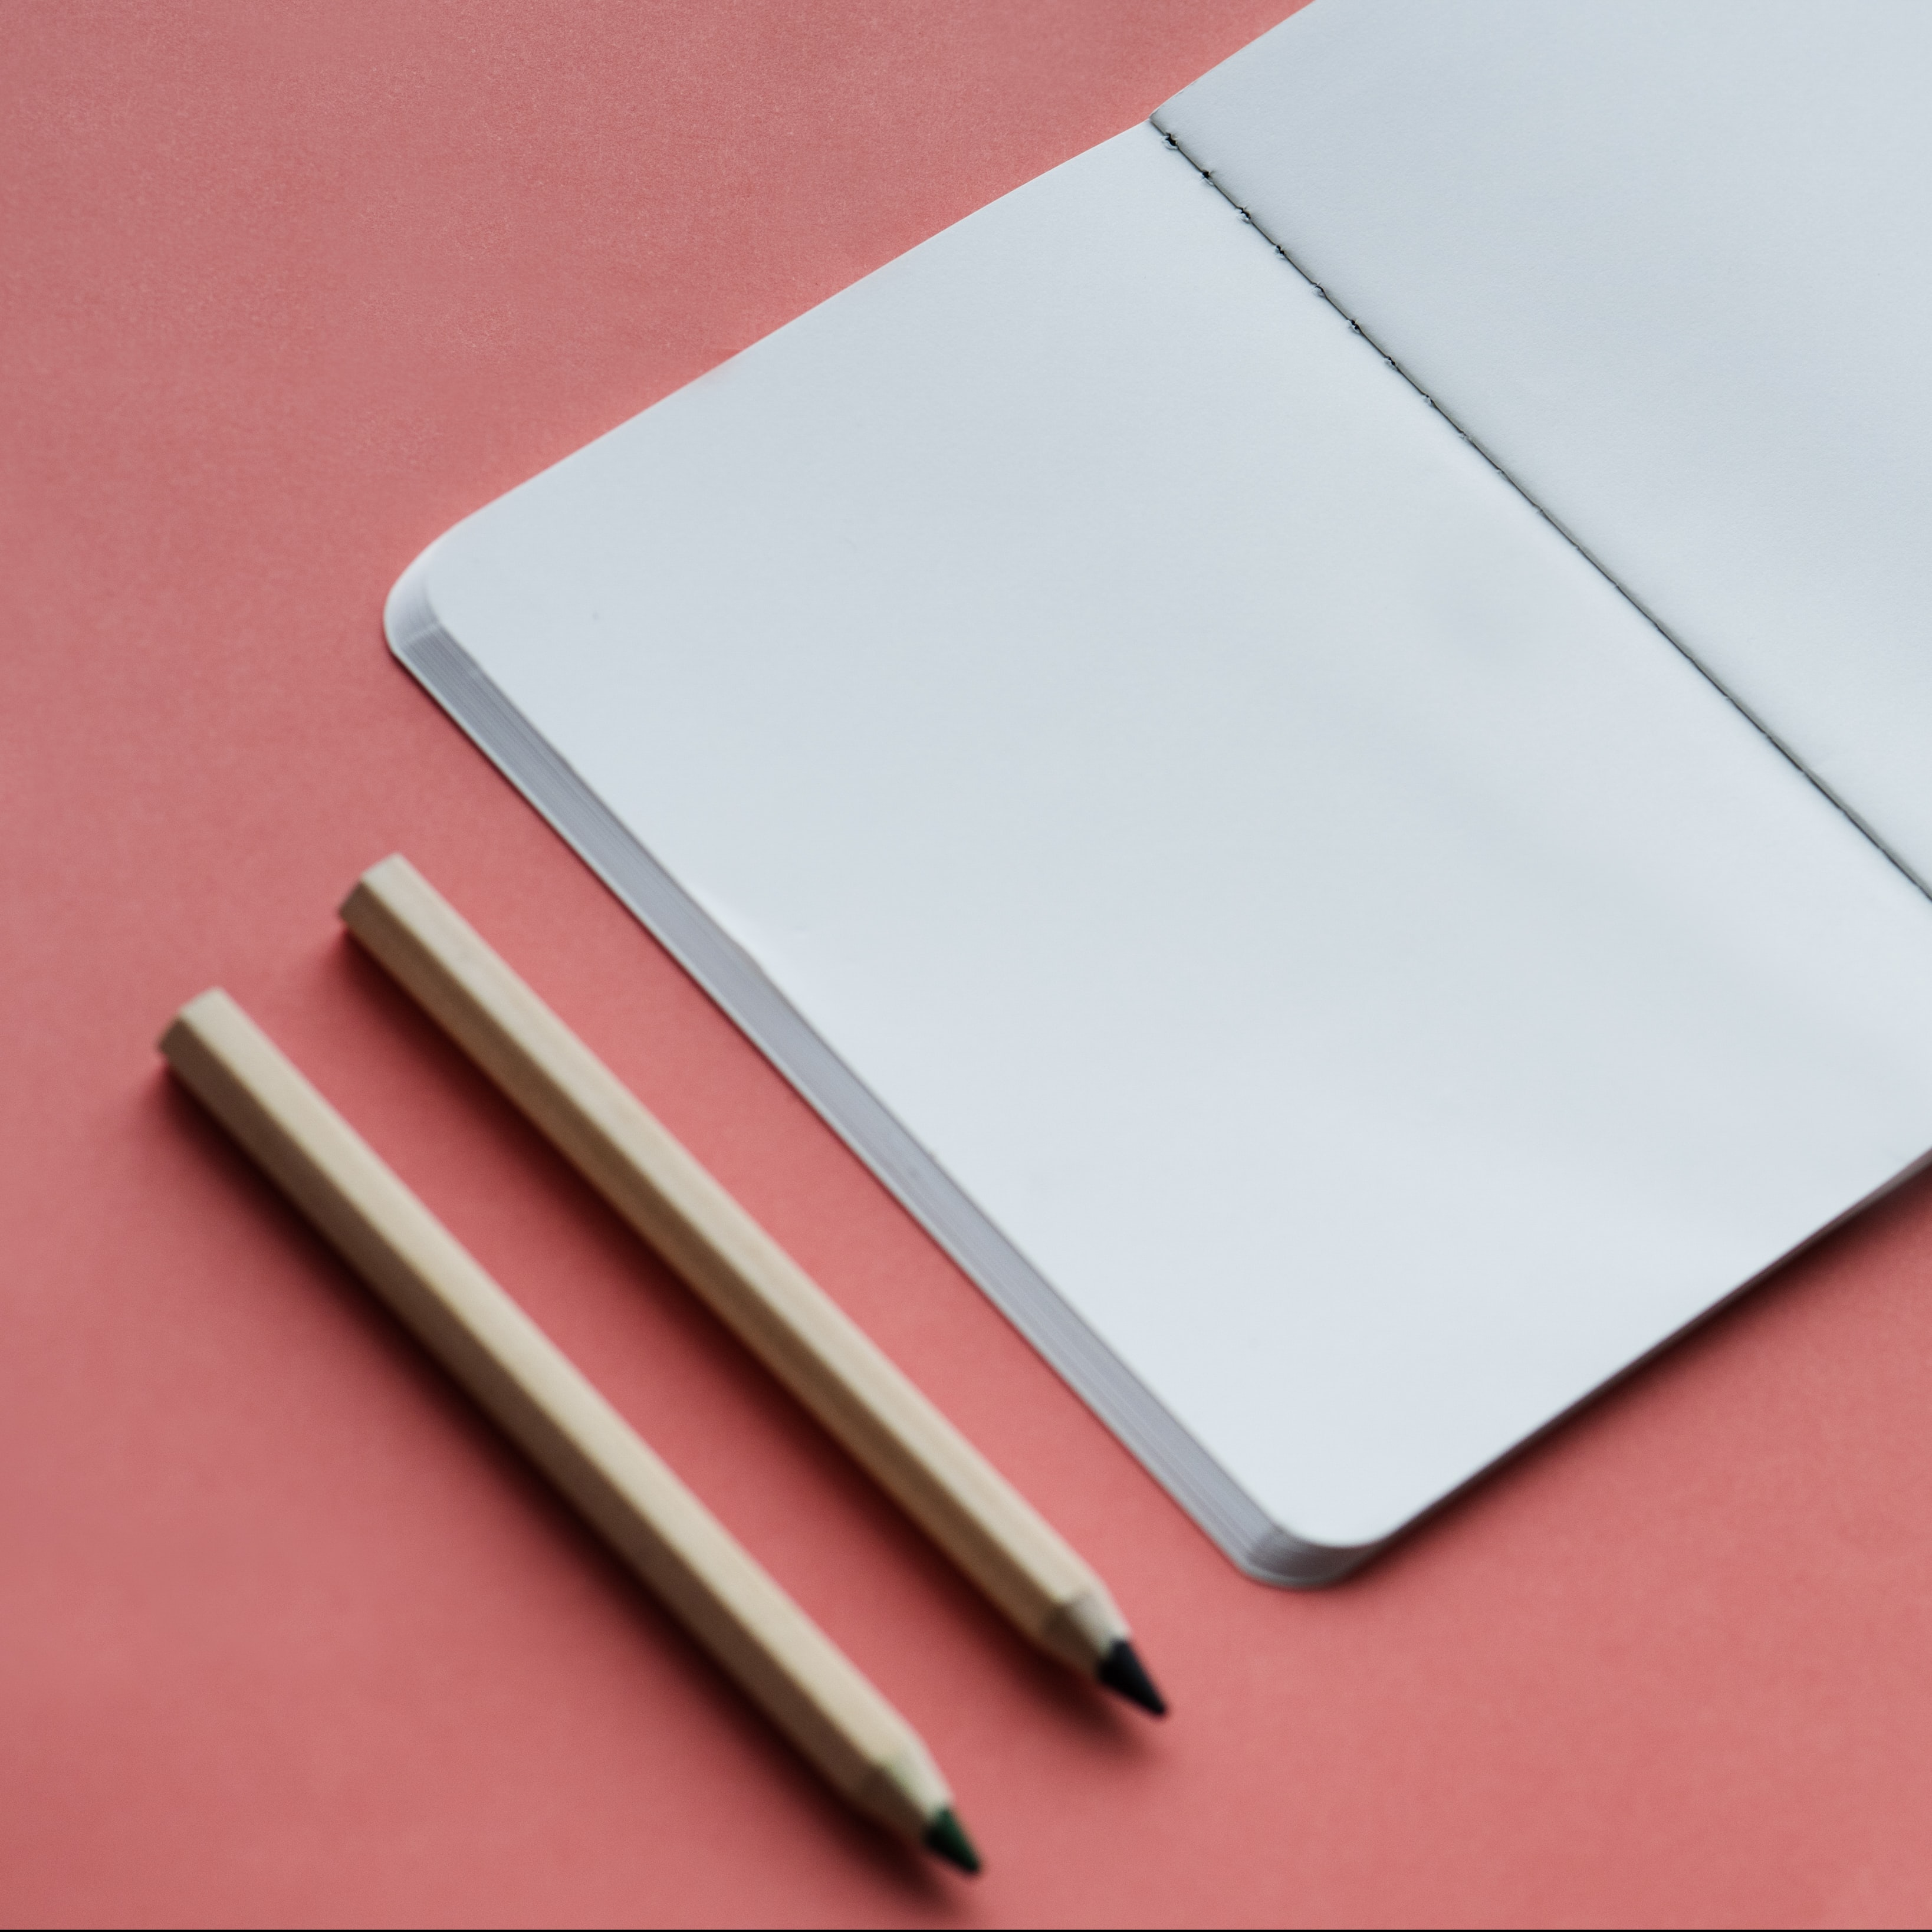 closeup photo of open book beside pencils